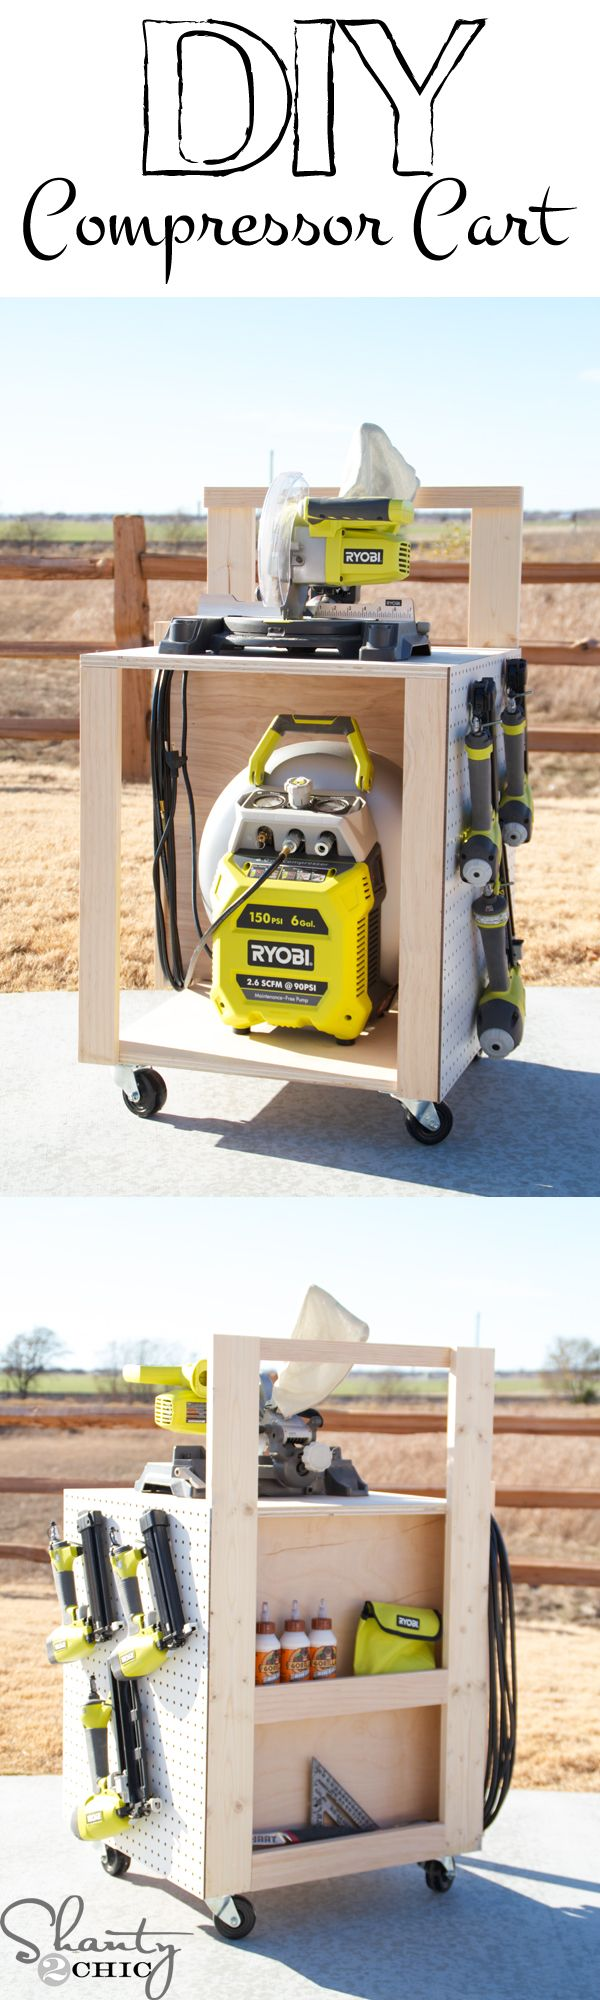 DIY Air Compressor Cart Woodworking projects, Diy garage